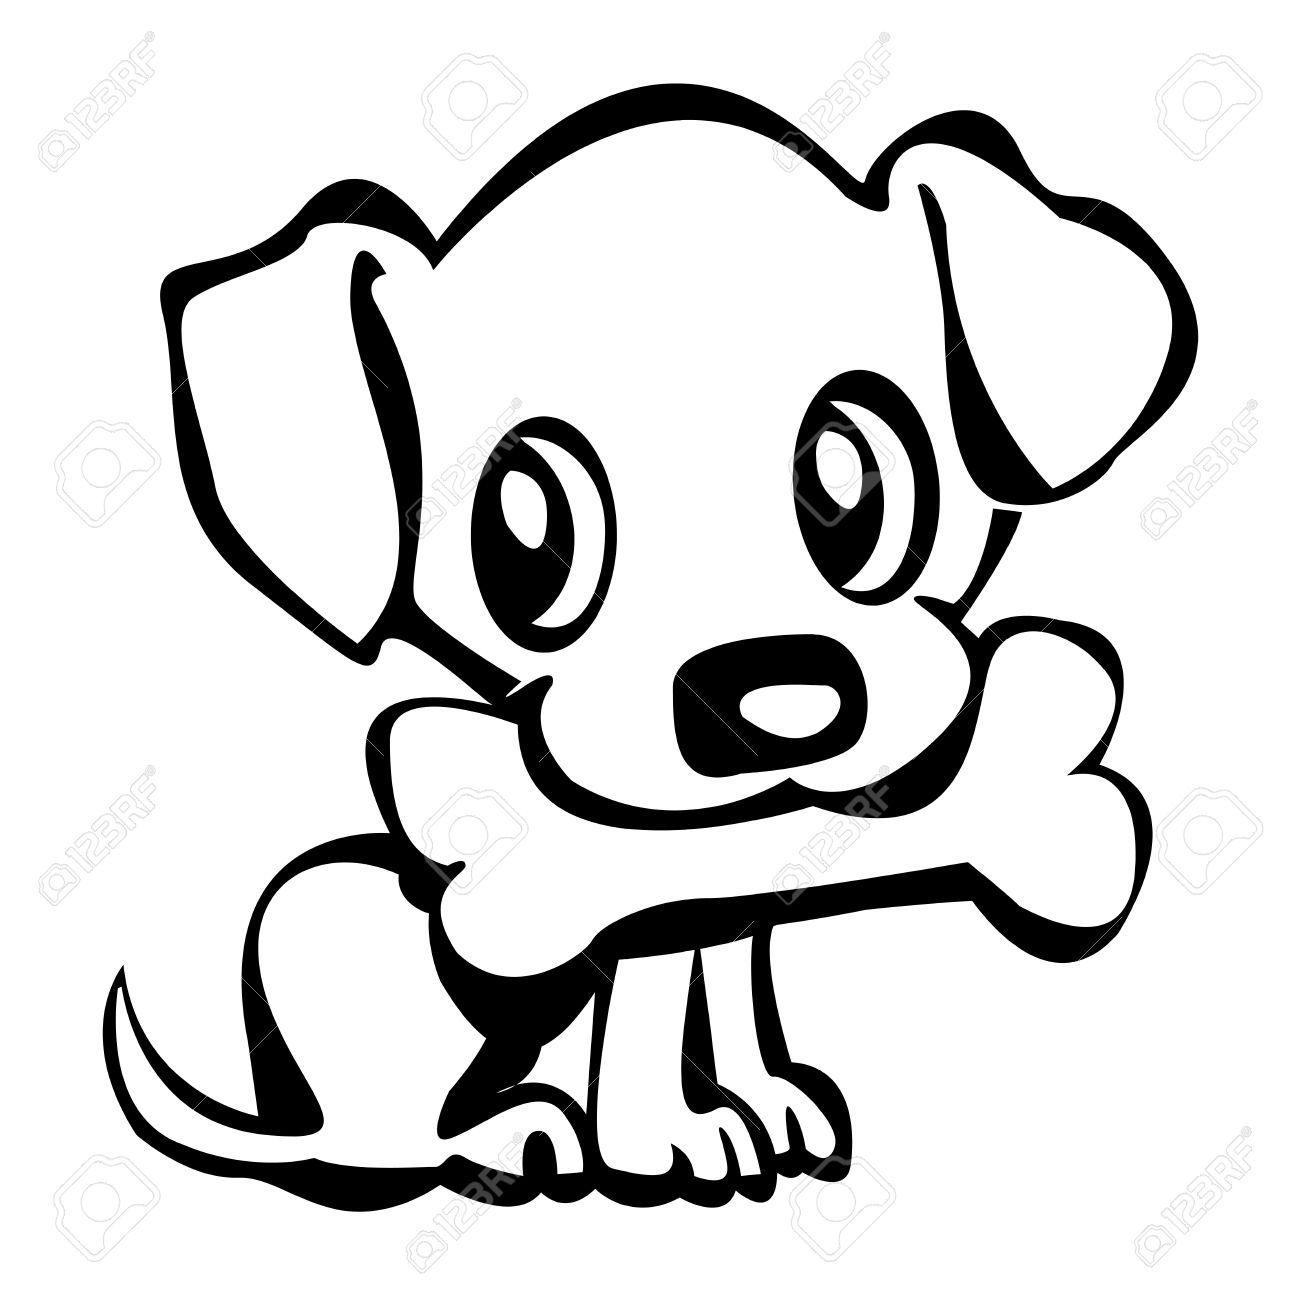 Dog Bone Outline - HVGJ | Puppy | Puppy clipart, Cute dog ... - photo#12